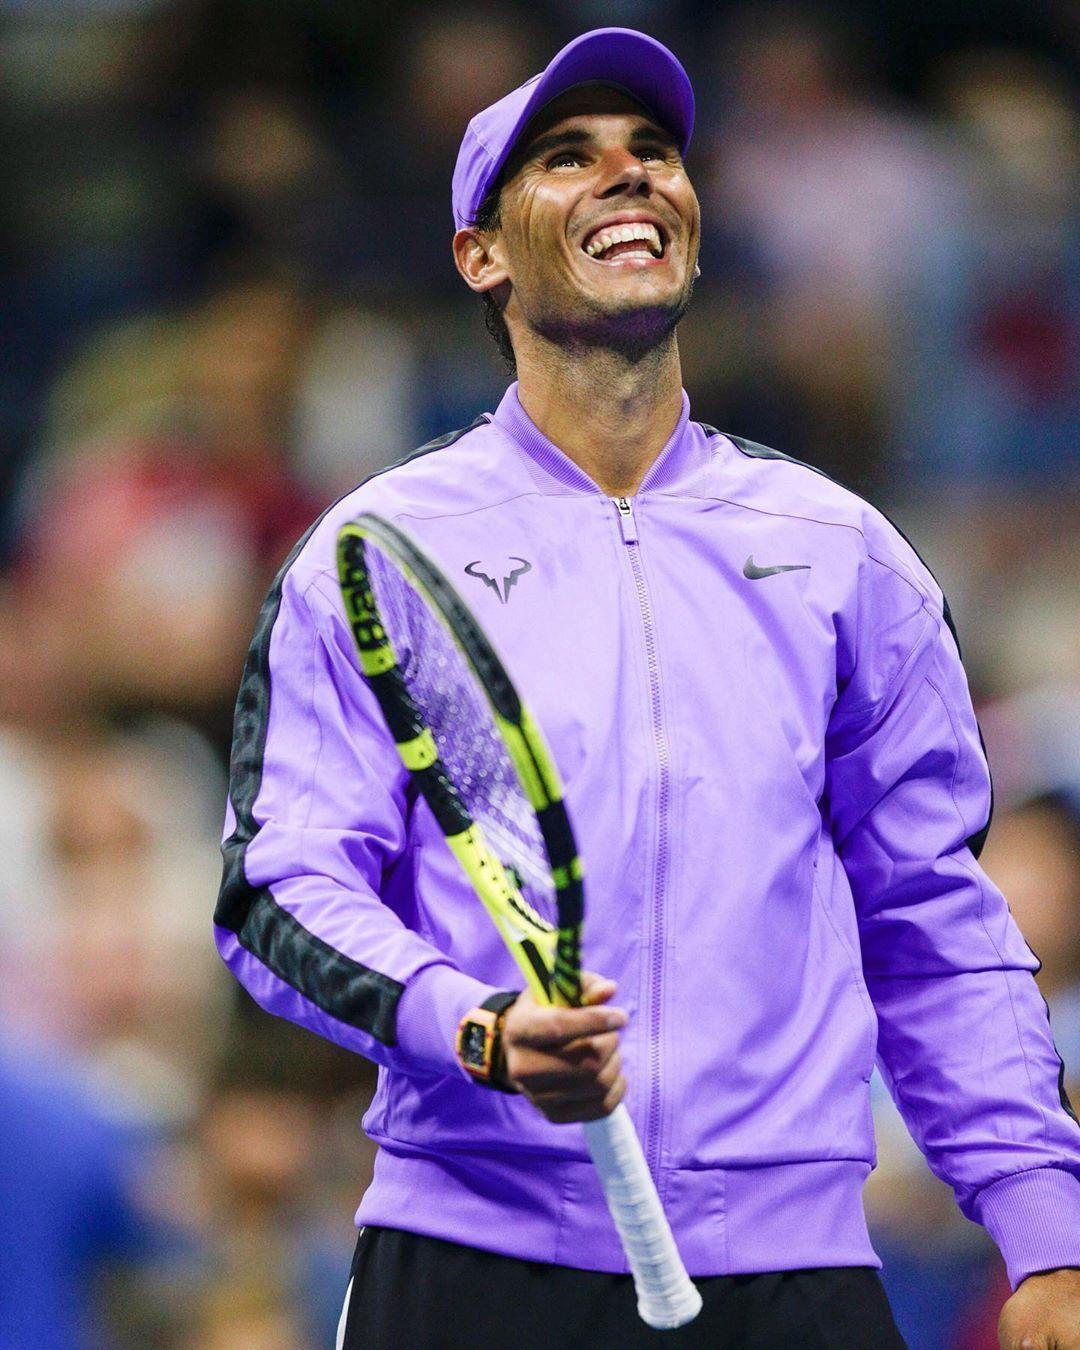 Gq On Instagram Rafael Nadal In Two Big Fits Bigfitoftheday Rafael Nadal John Millman Rafa Nadal